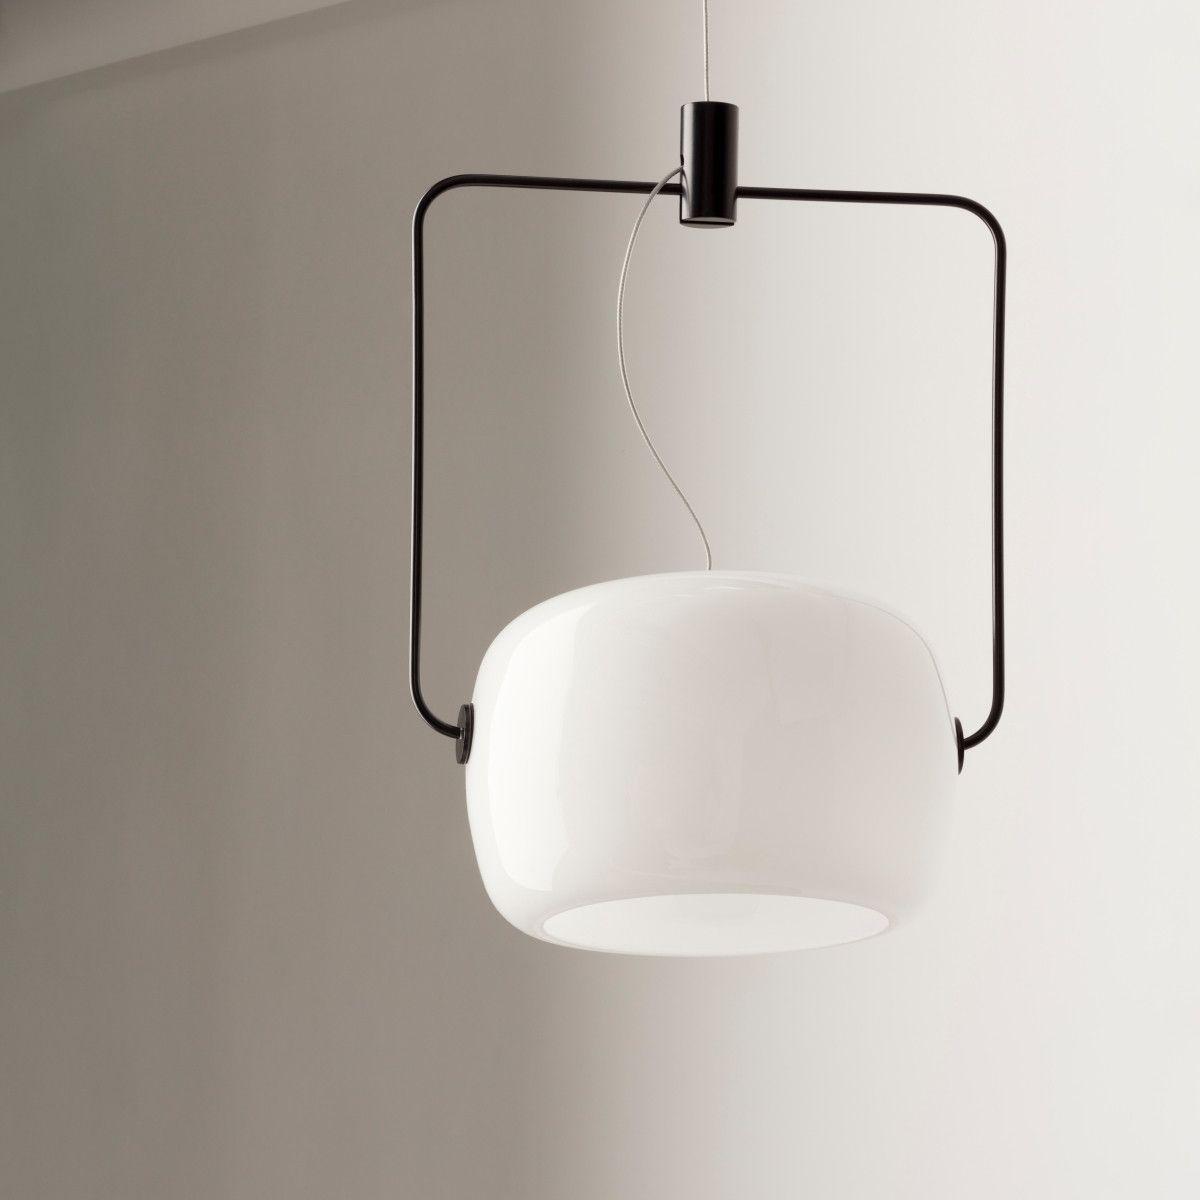 Lampa Wiszaca Galet 2 Bs Living Minimalism Interior Interior Lamp